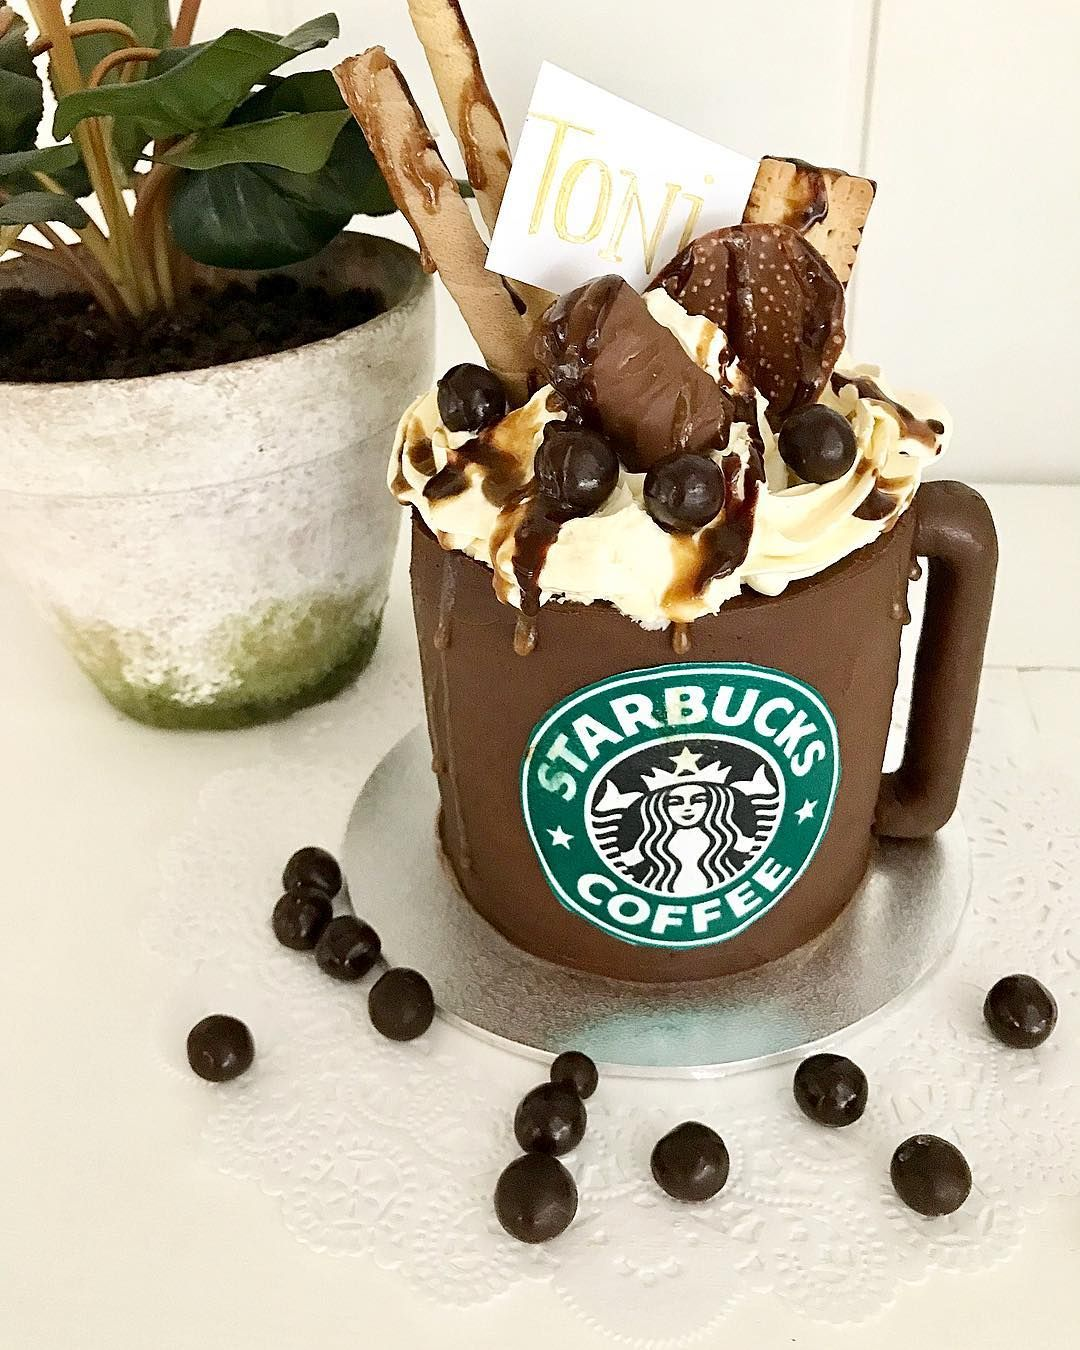 Pin by BriBriDIY on Starbucks cakes Starbucks cake